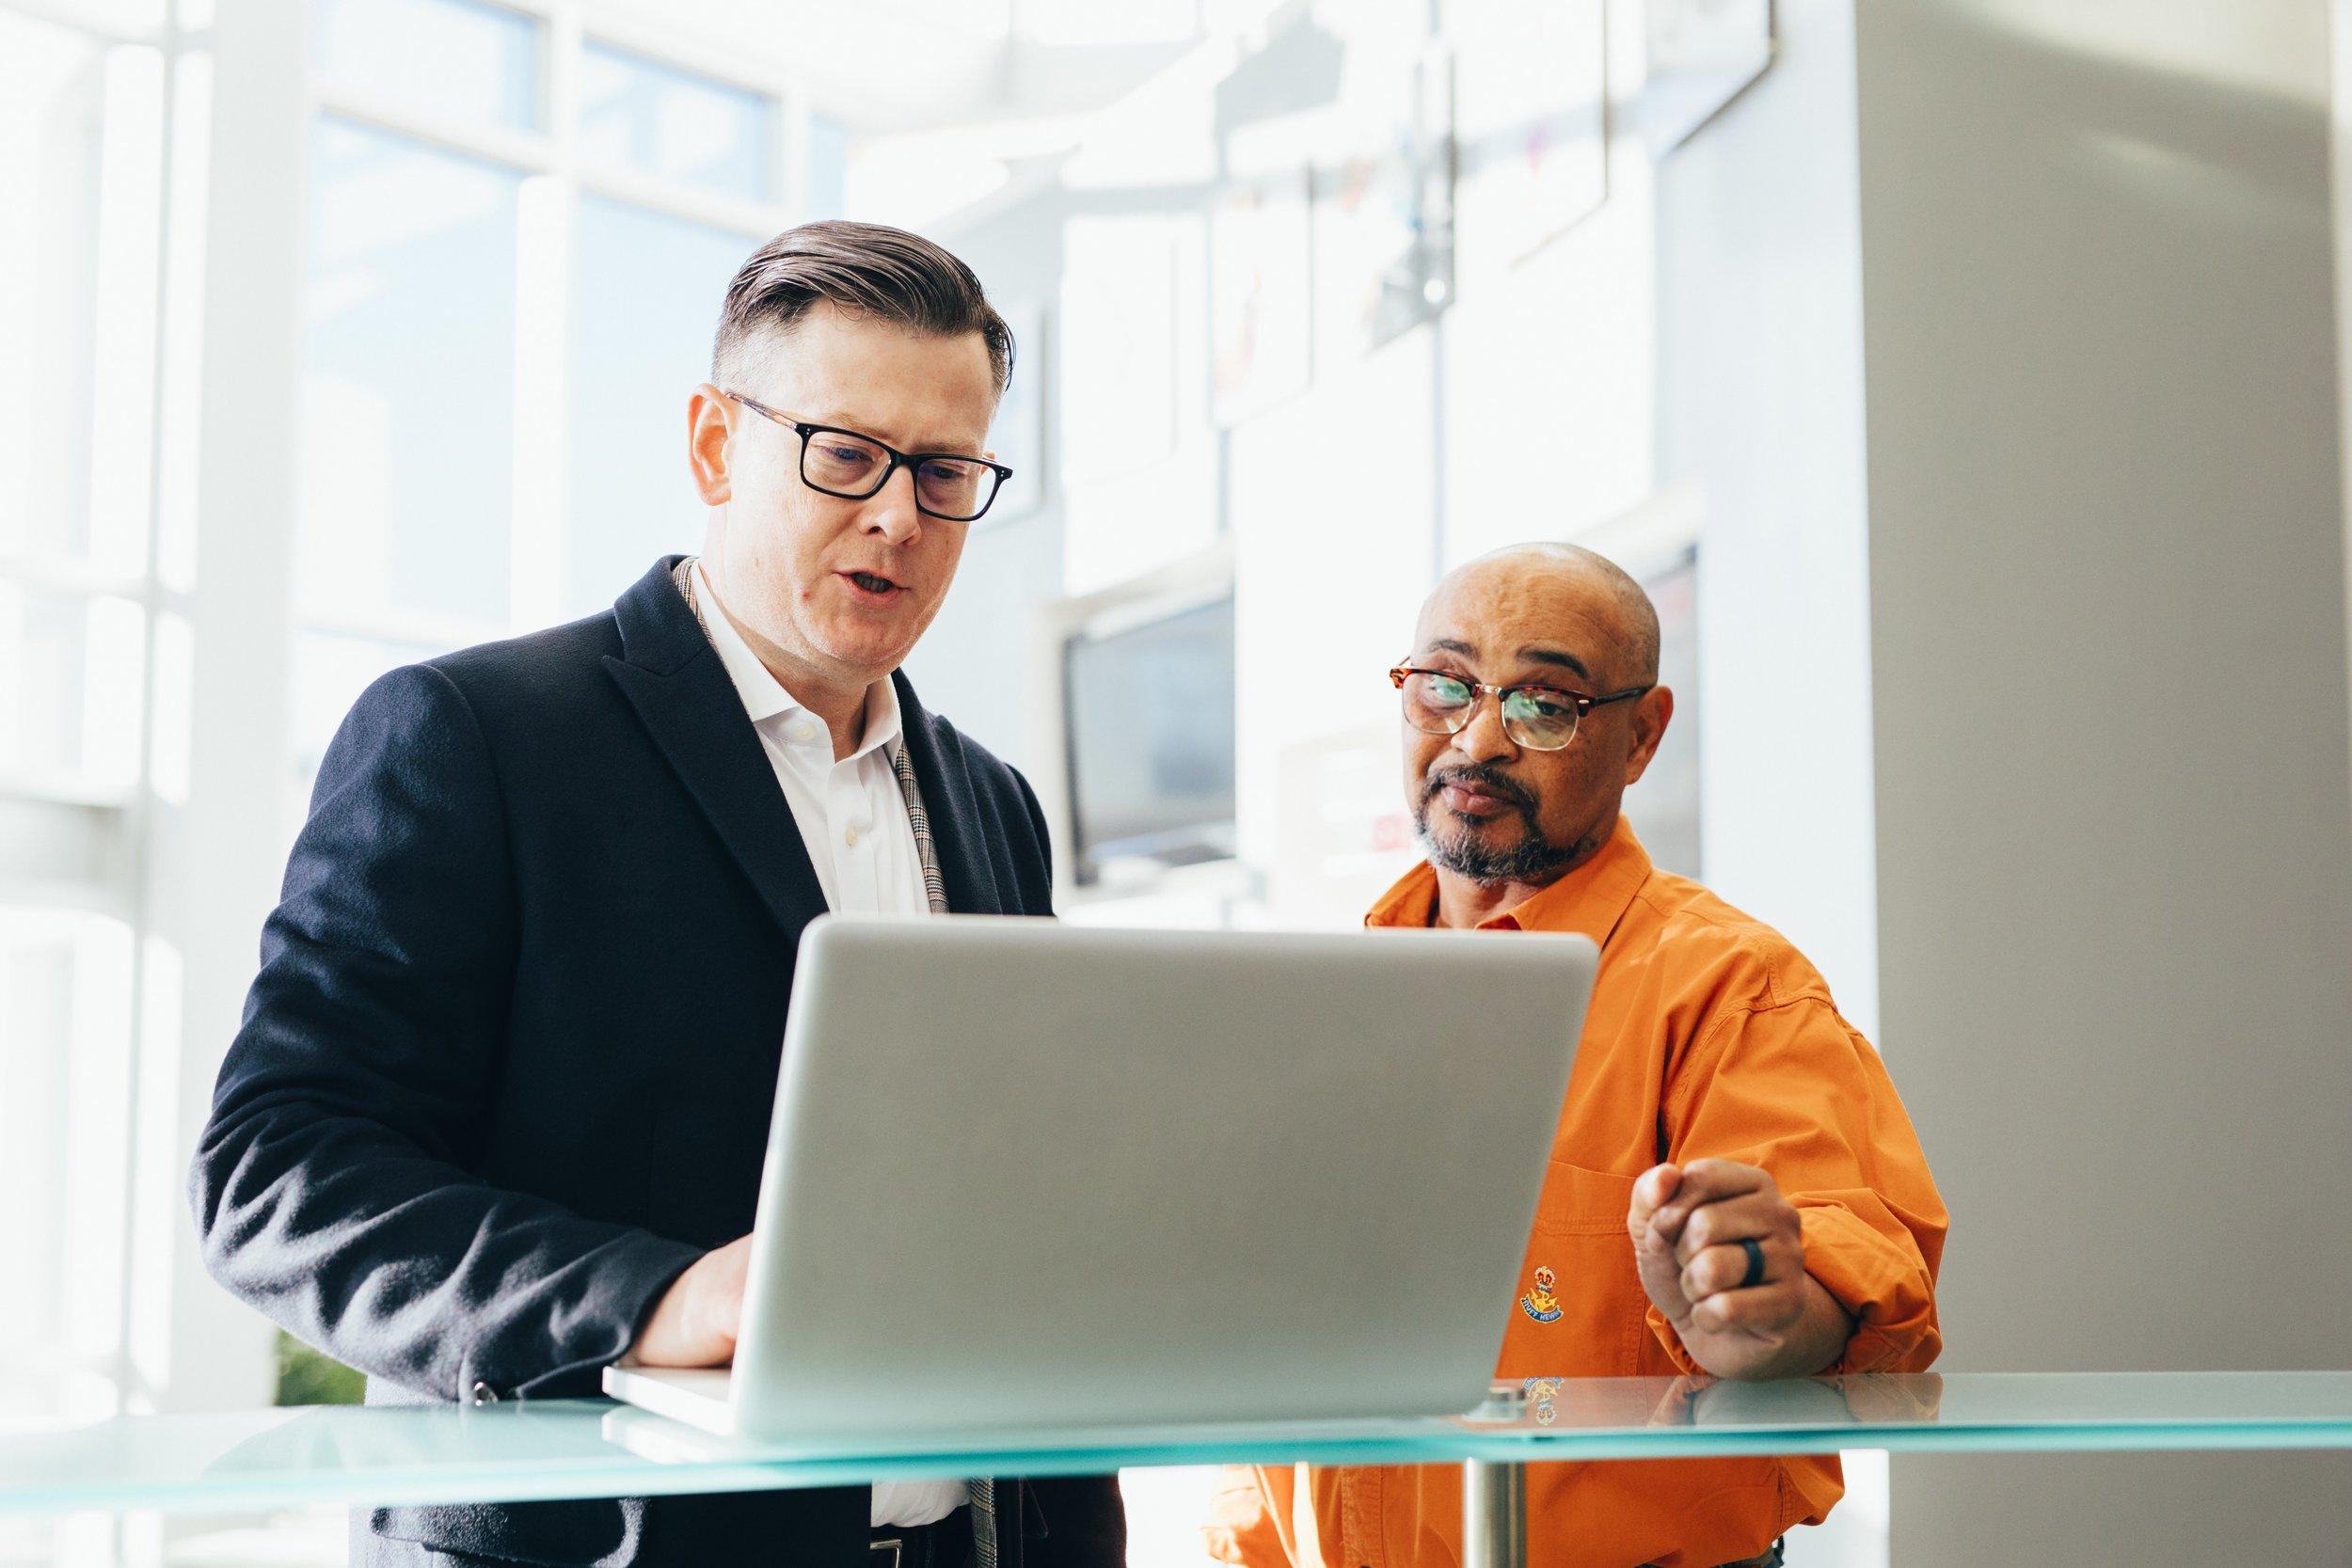 Businessmen Discussing Process